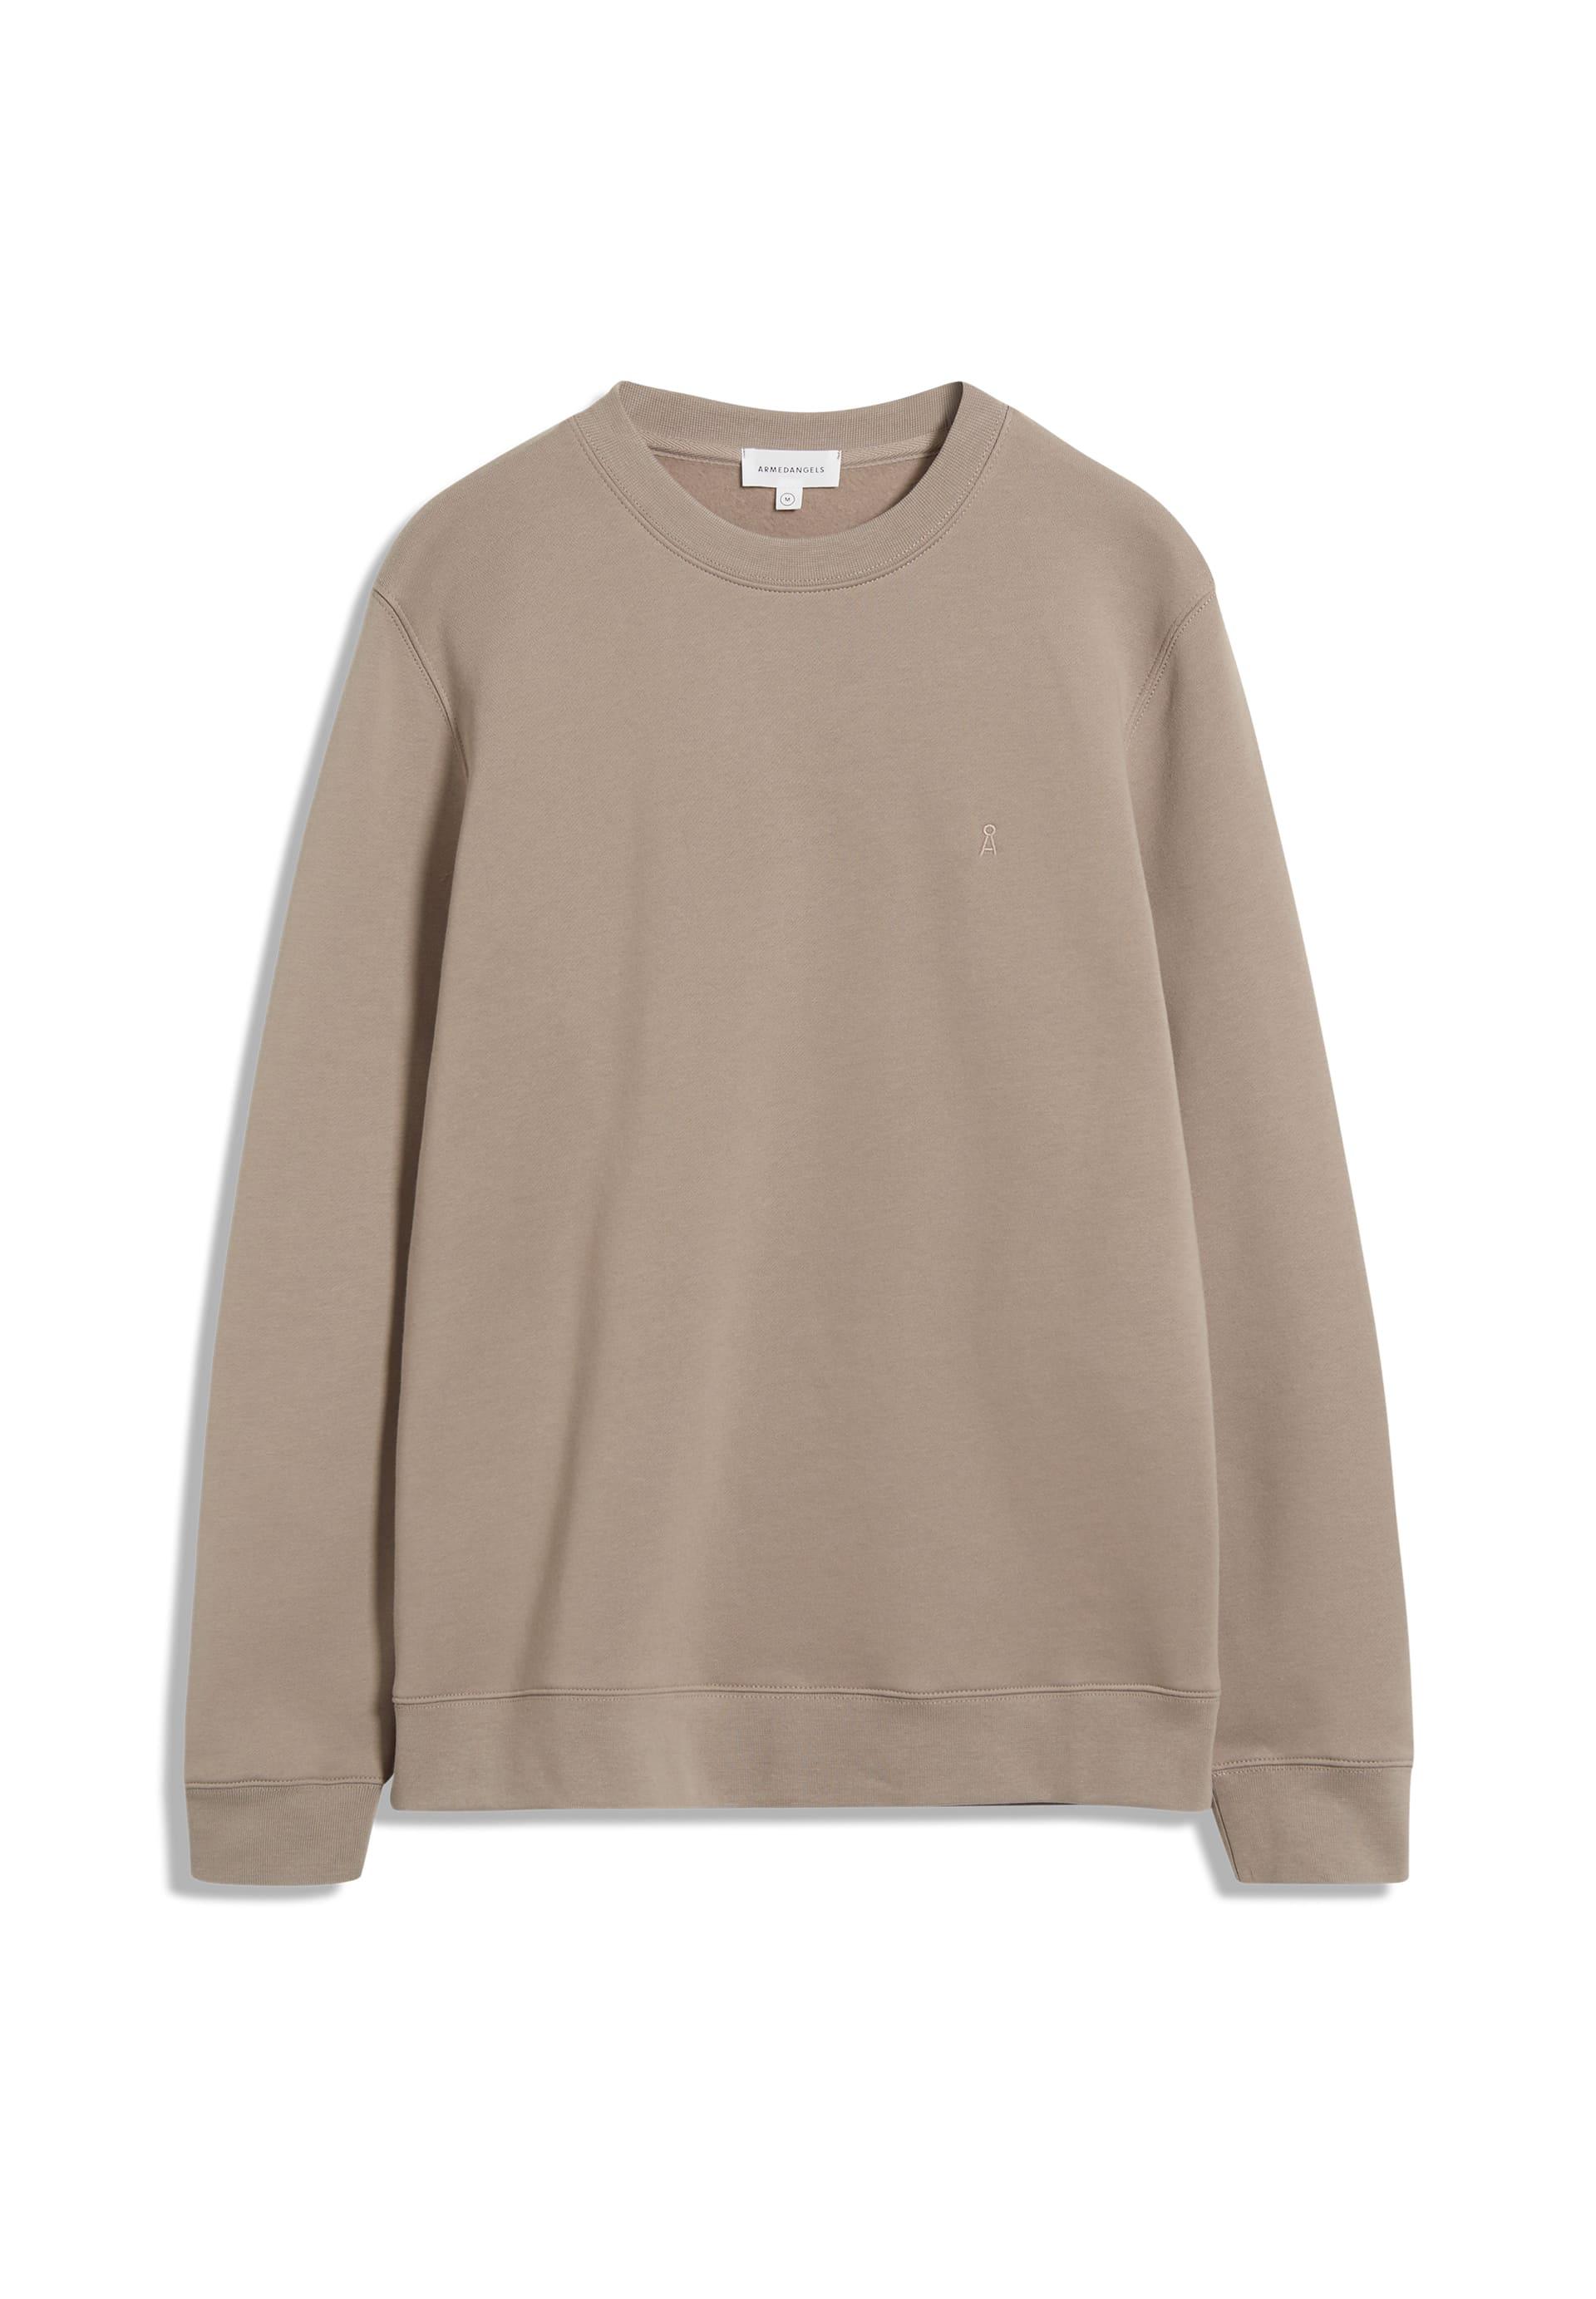 MAALTE COMFORT Sweatshirt made of Organic Cotton